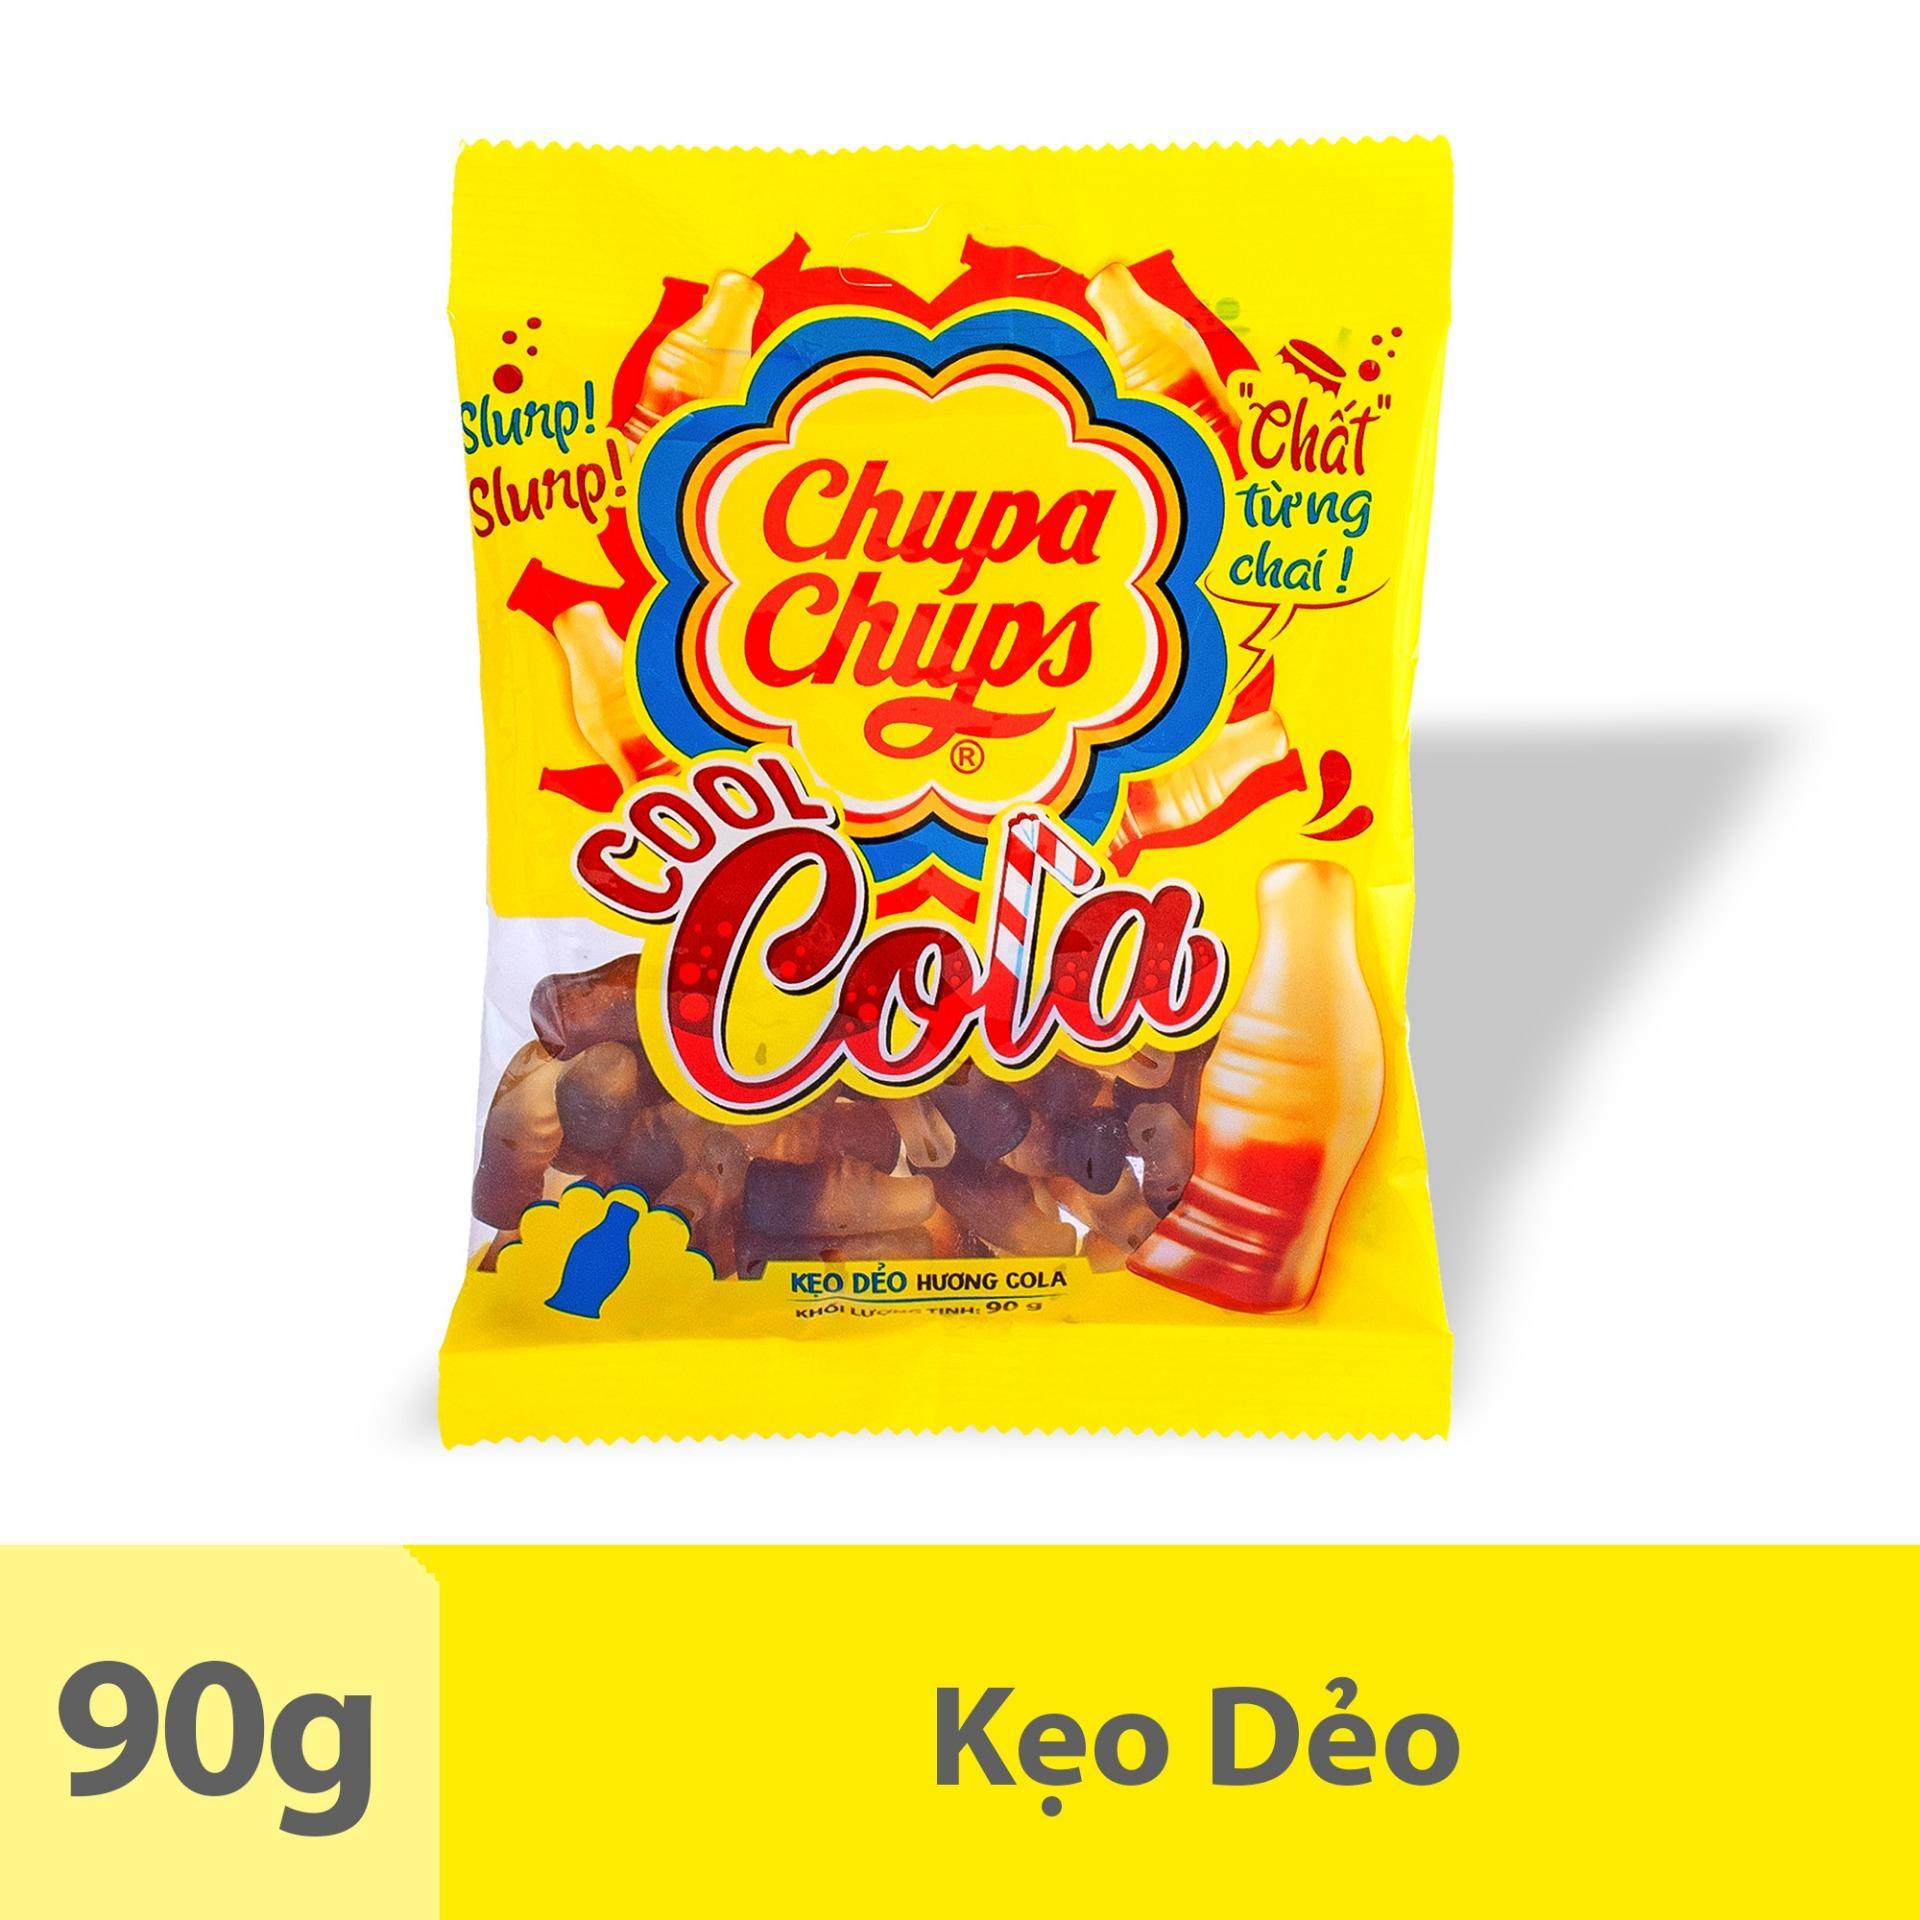 Kẹo Dẻo Chupa Chups Cool Cola (Gói 90g)